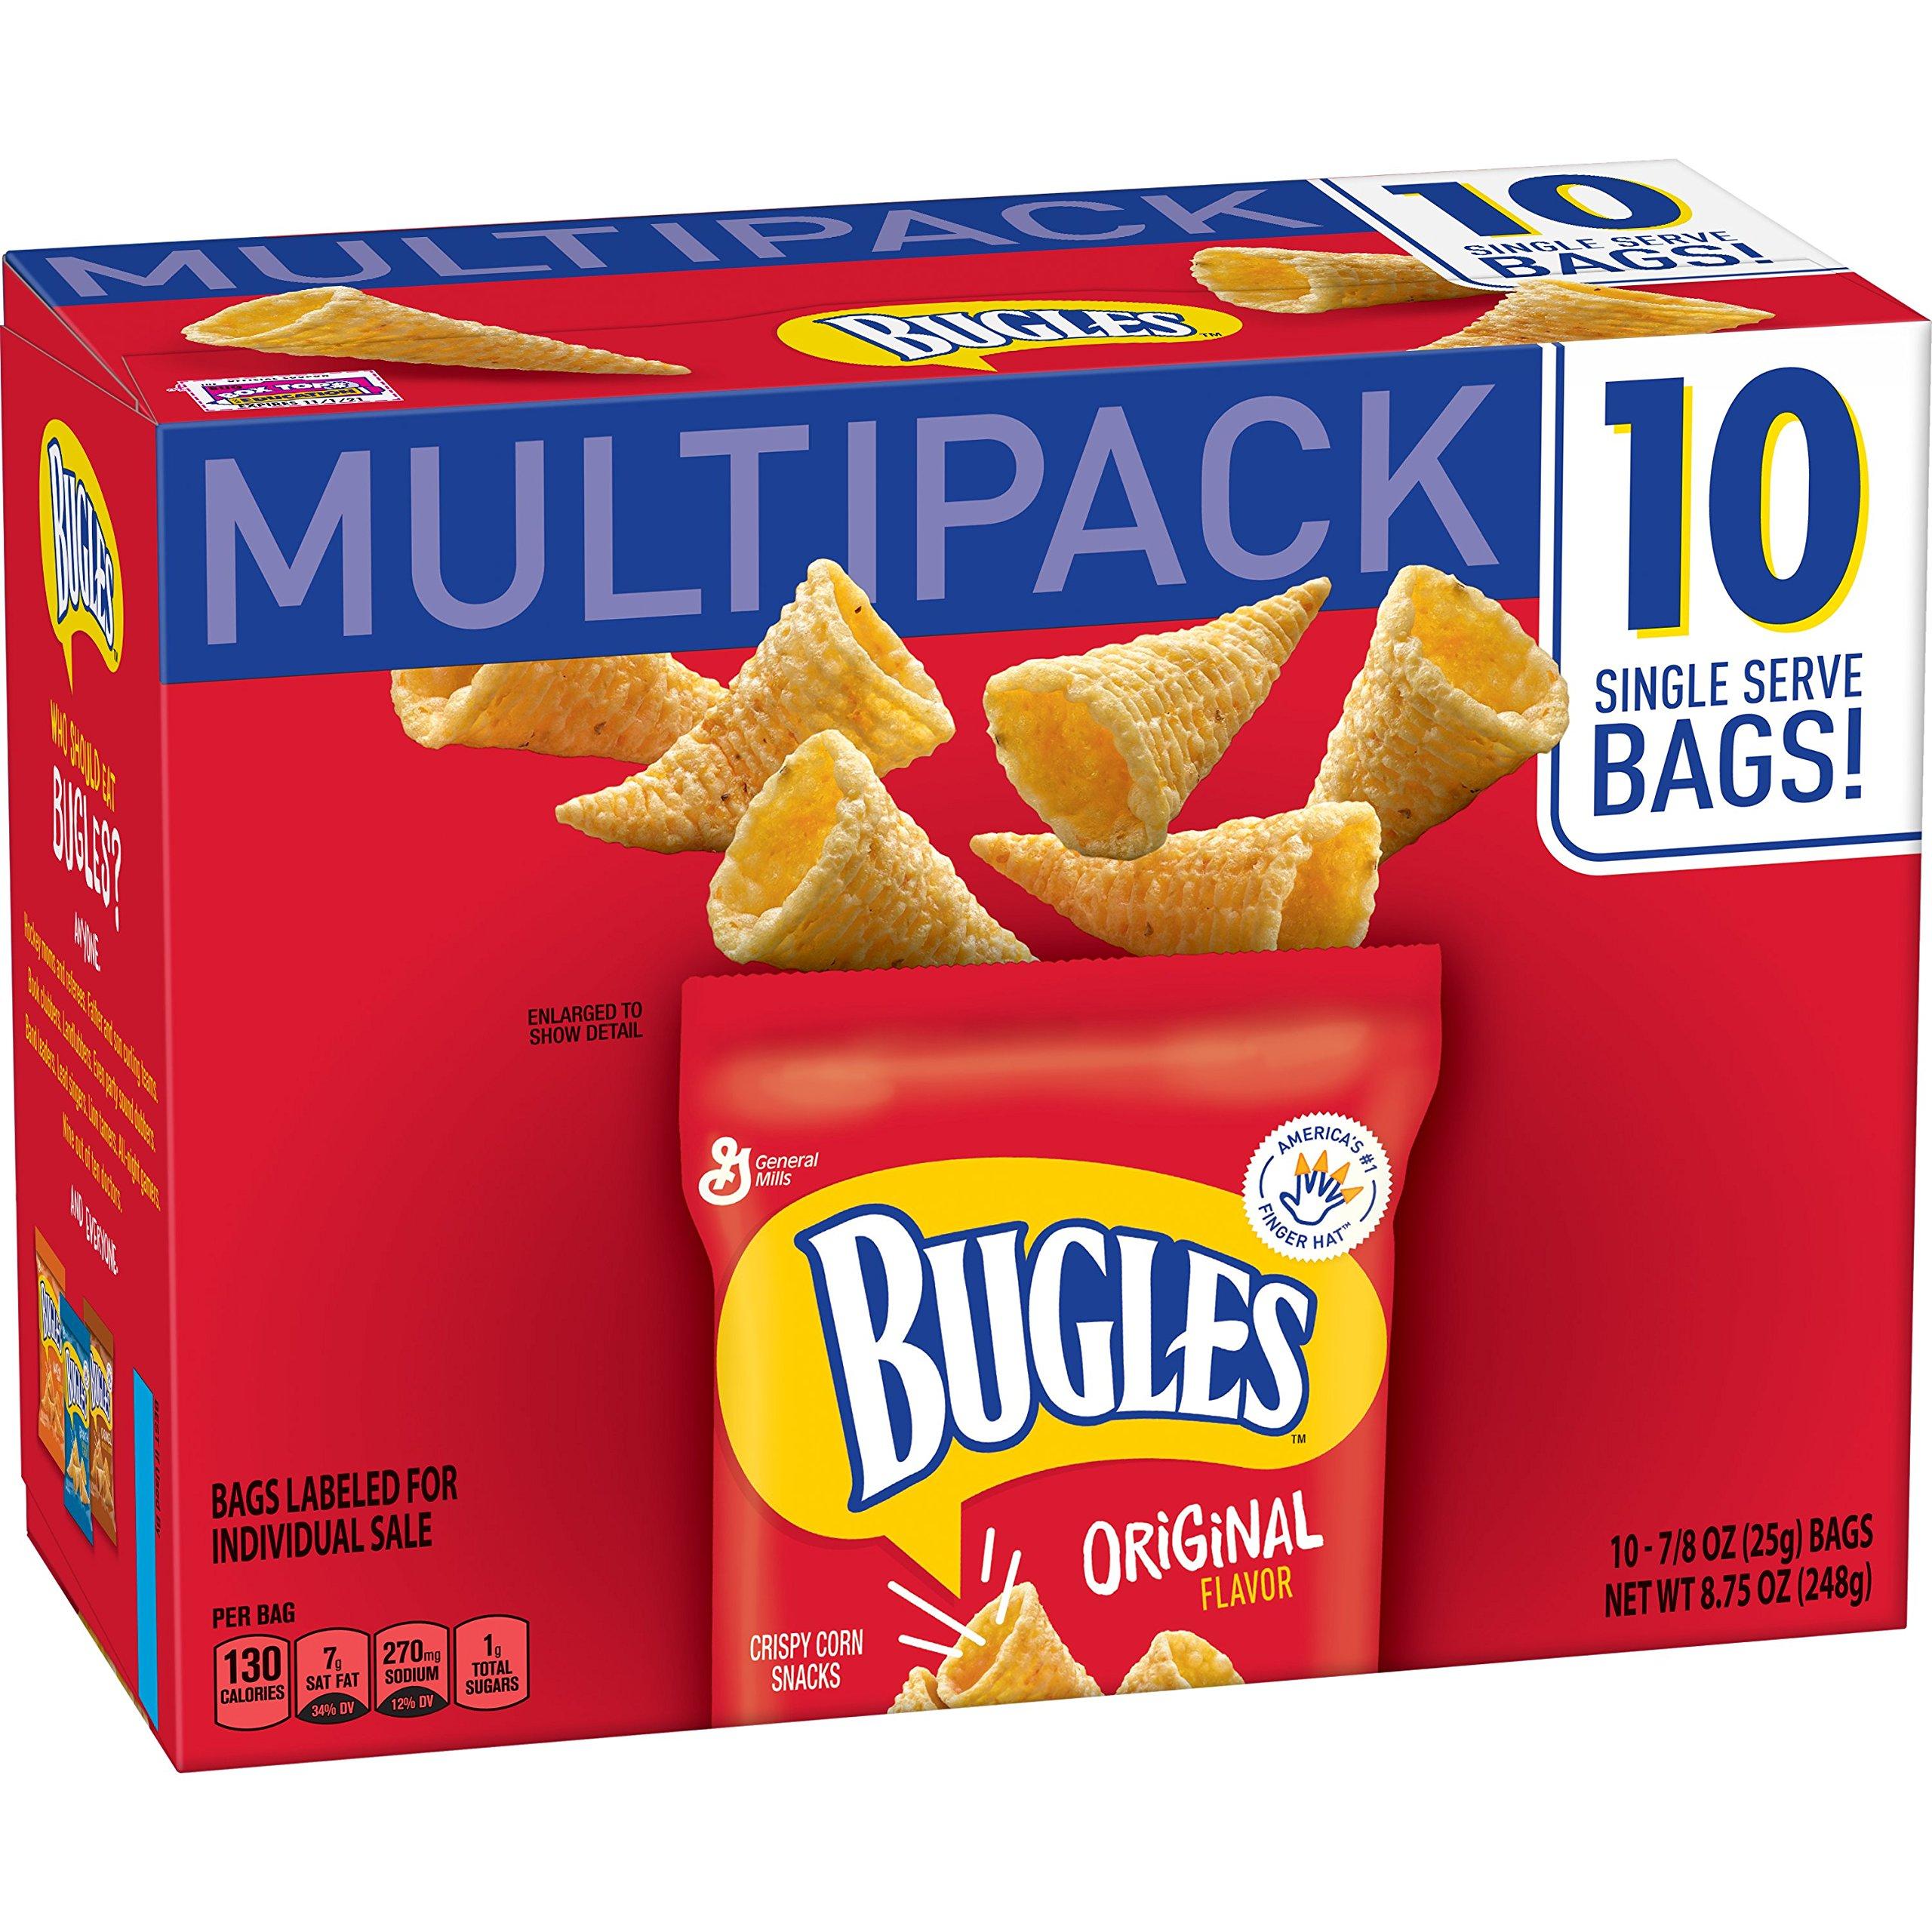 Bugles Original Flavor Crispy Corn Snacks Bags, 10 Count (Pack of 4)